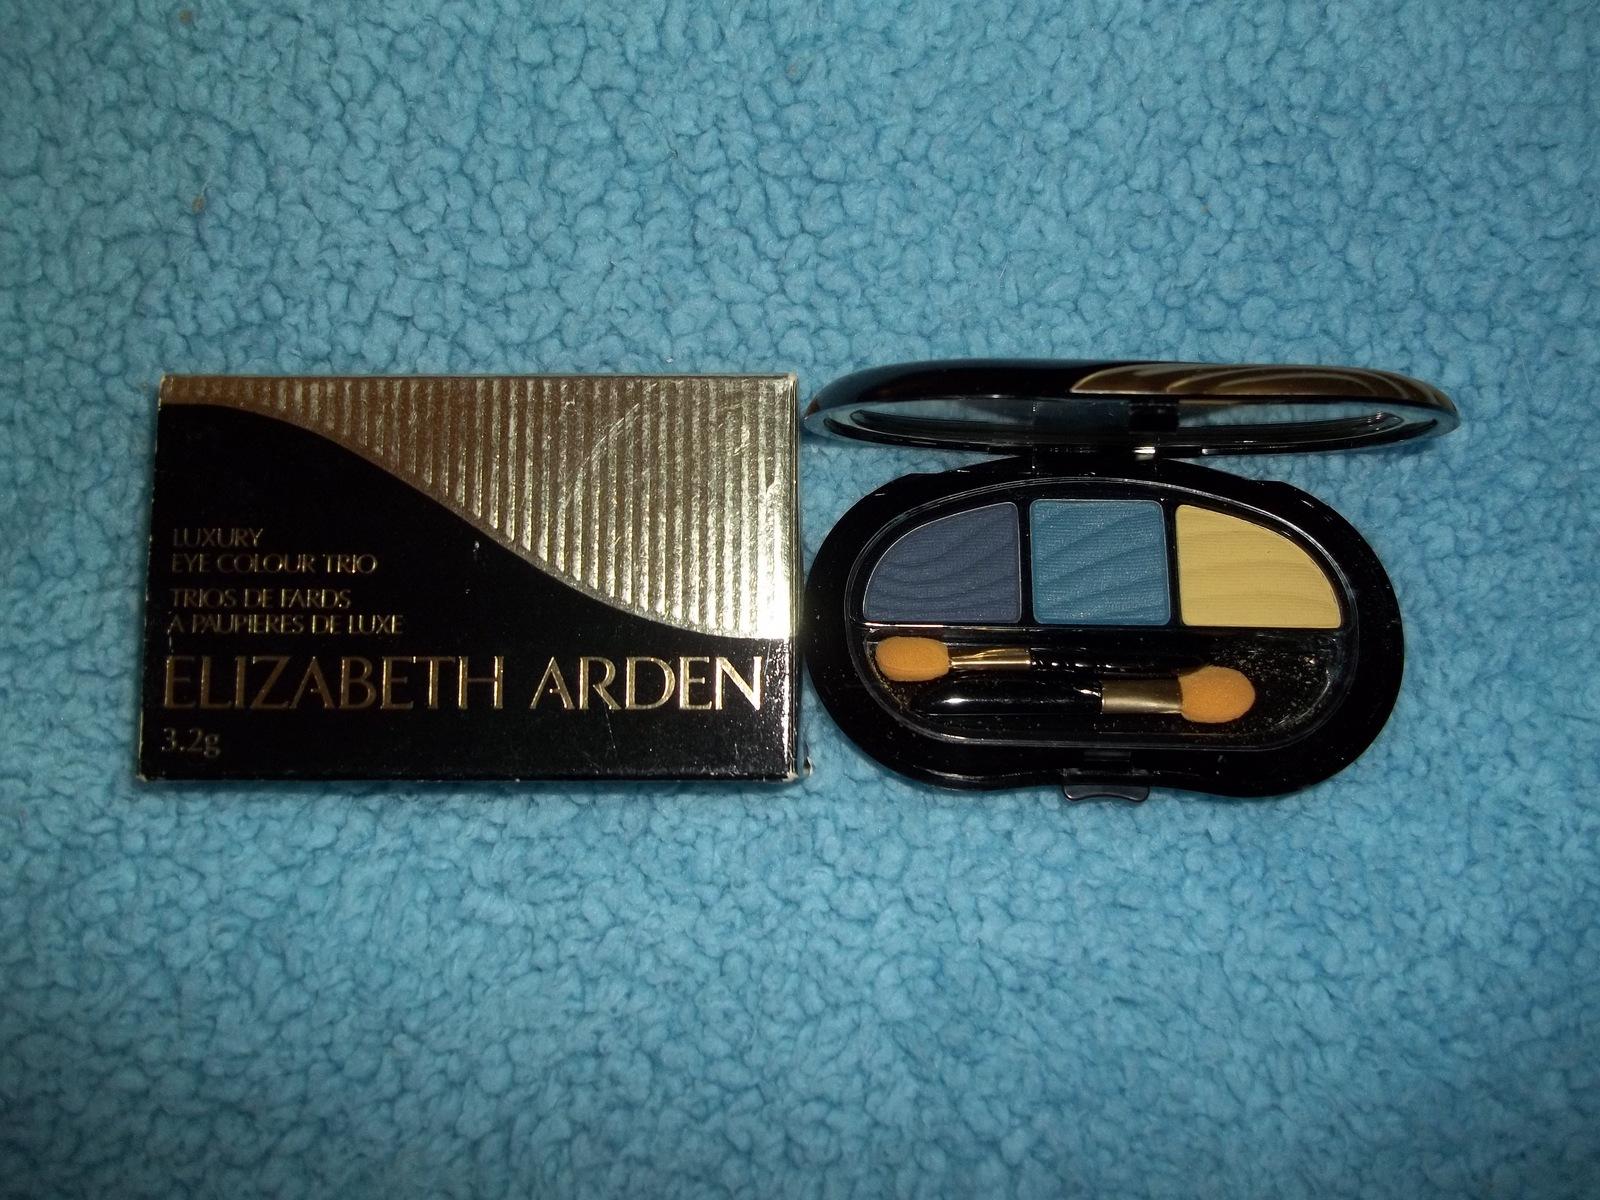 Elisabeth Arden Luxury Eye Color Trio Art Deco Shadows. Full Size - $12.99